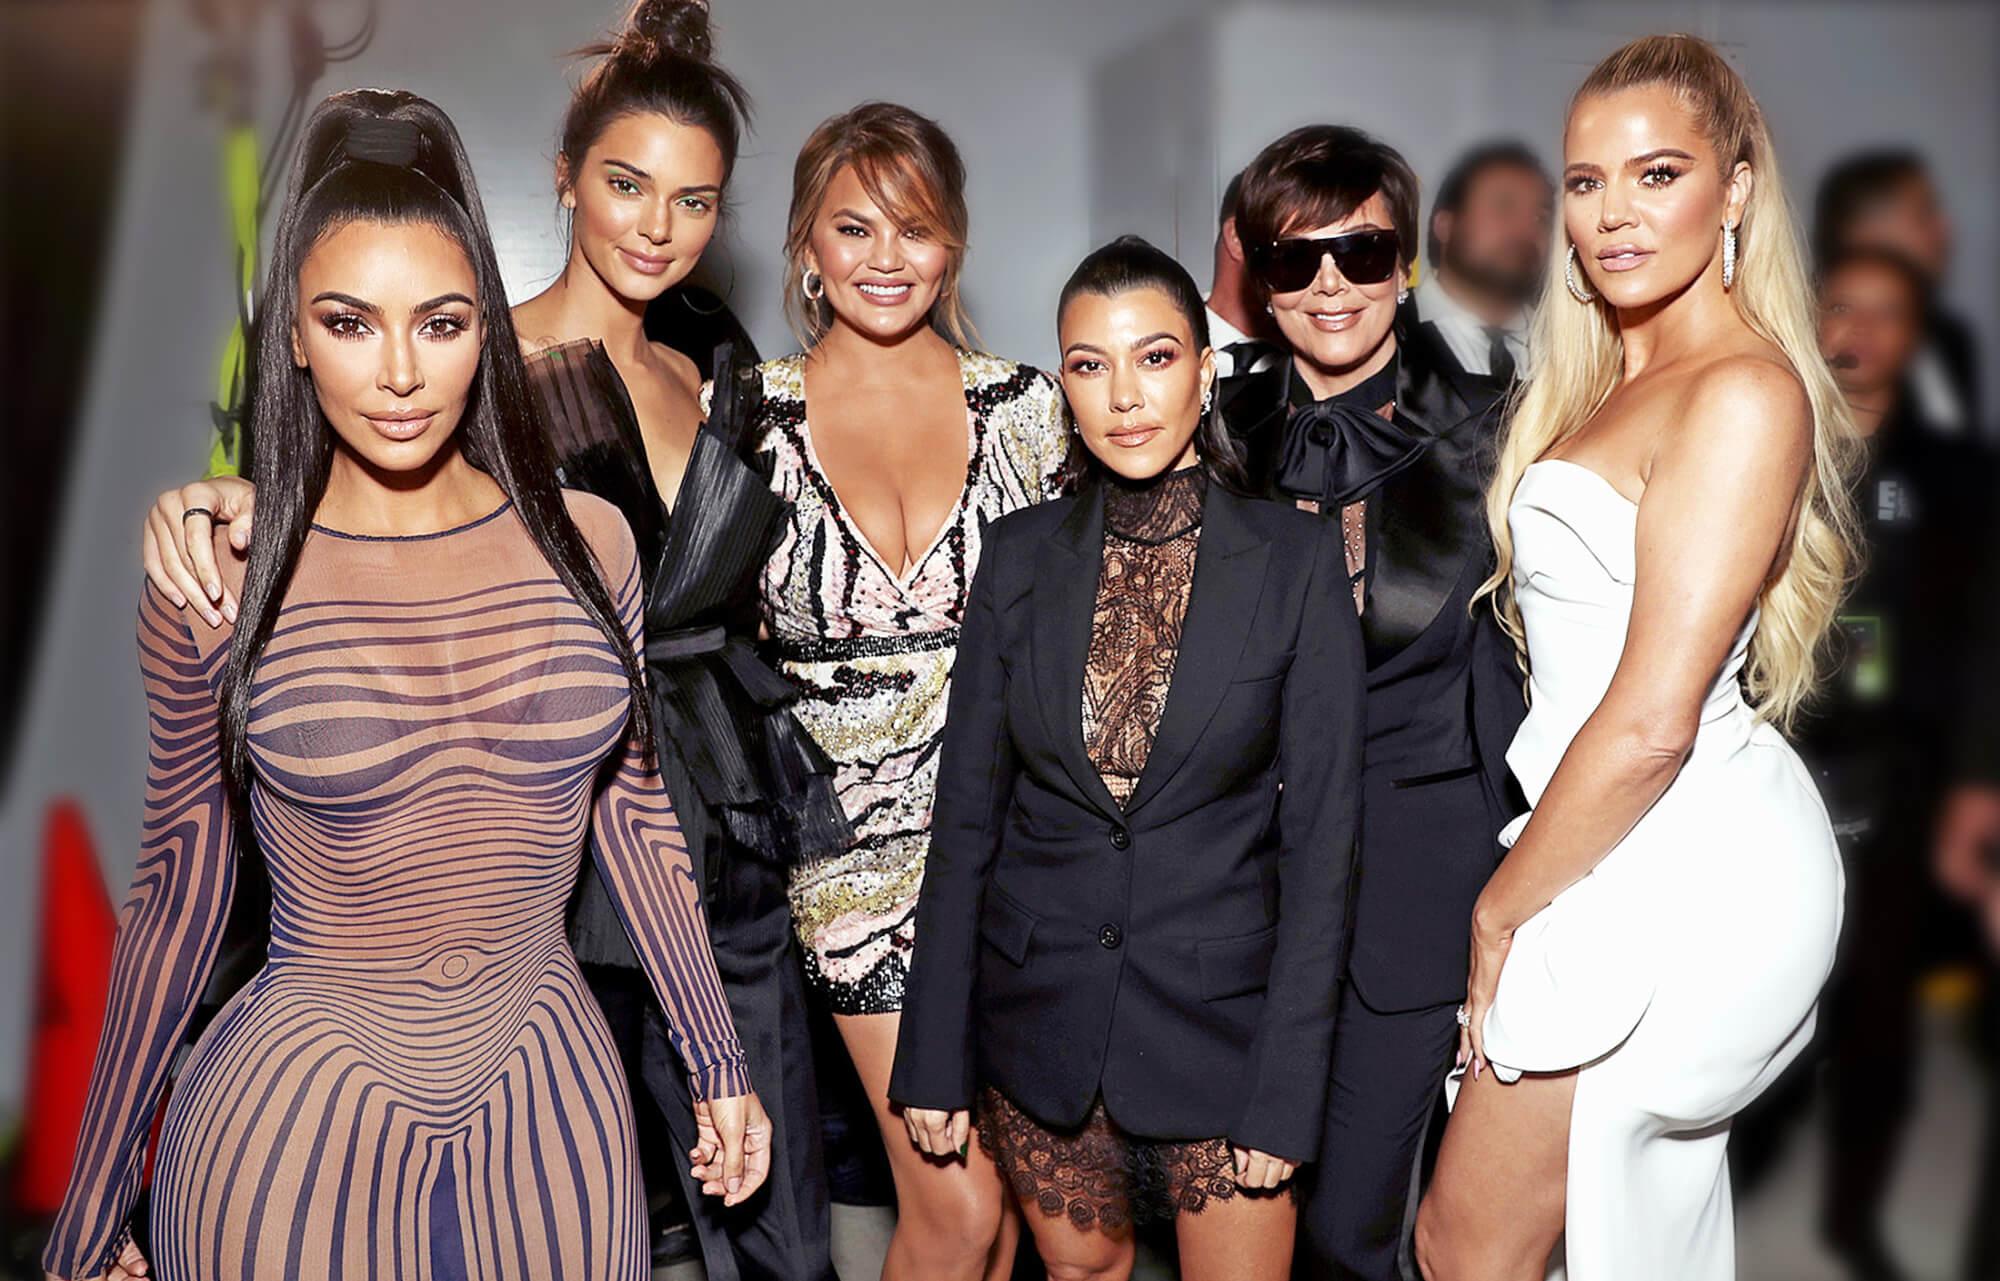 Kim-Kardashian-Kendall-Jenner-Chrissy-Teigen-Kourtney-Kardashian-Kris-Jenner-and-Khloe-Kardashian